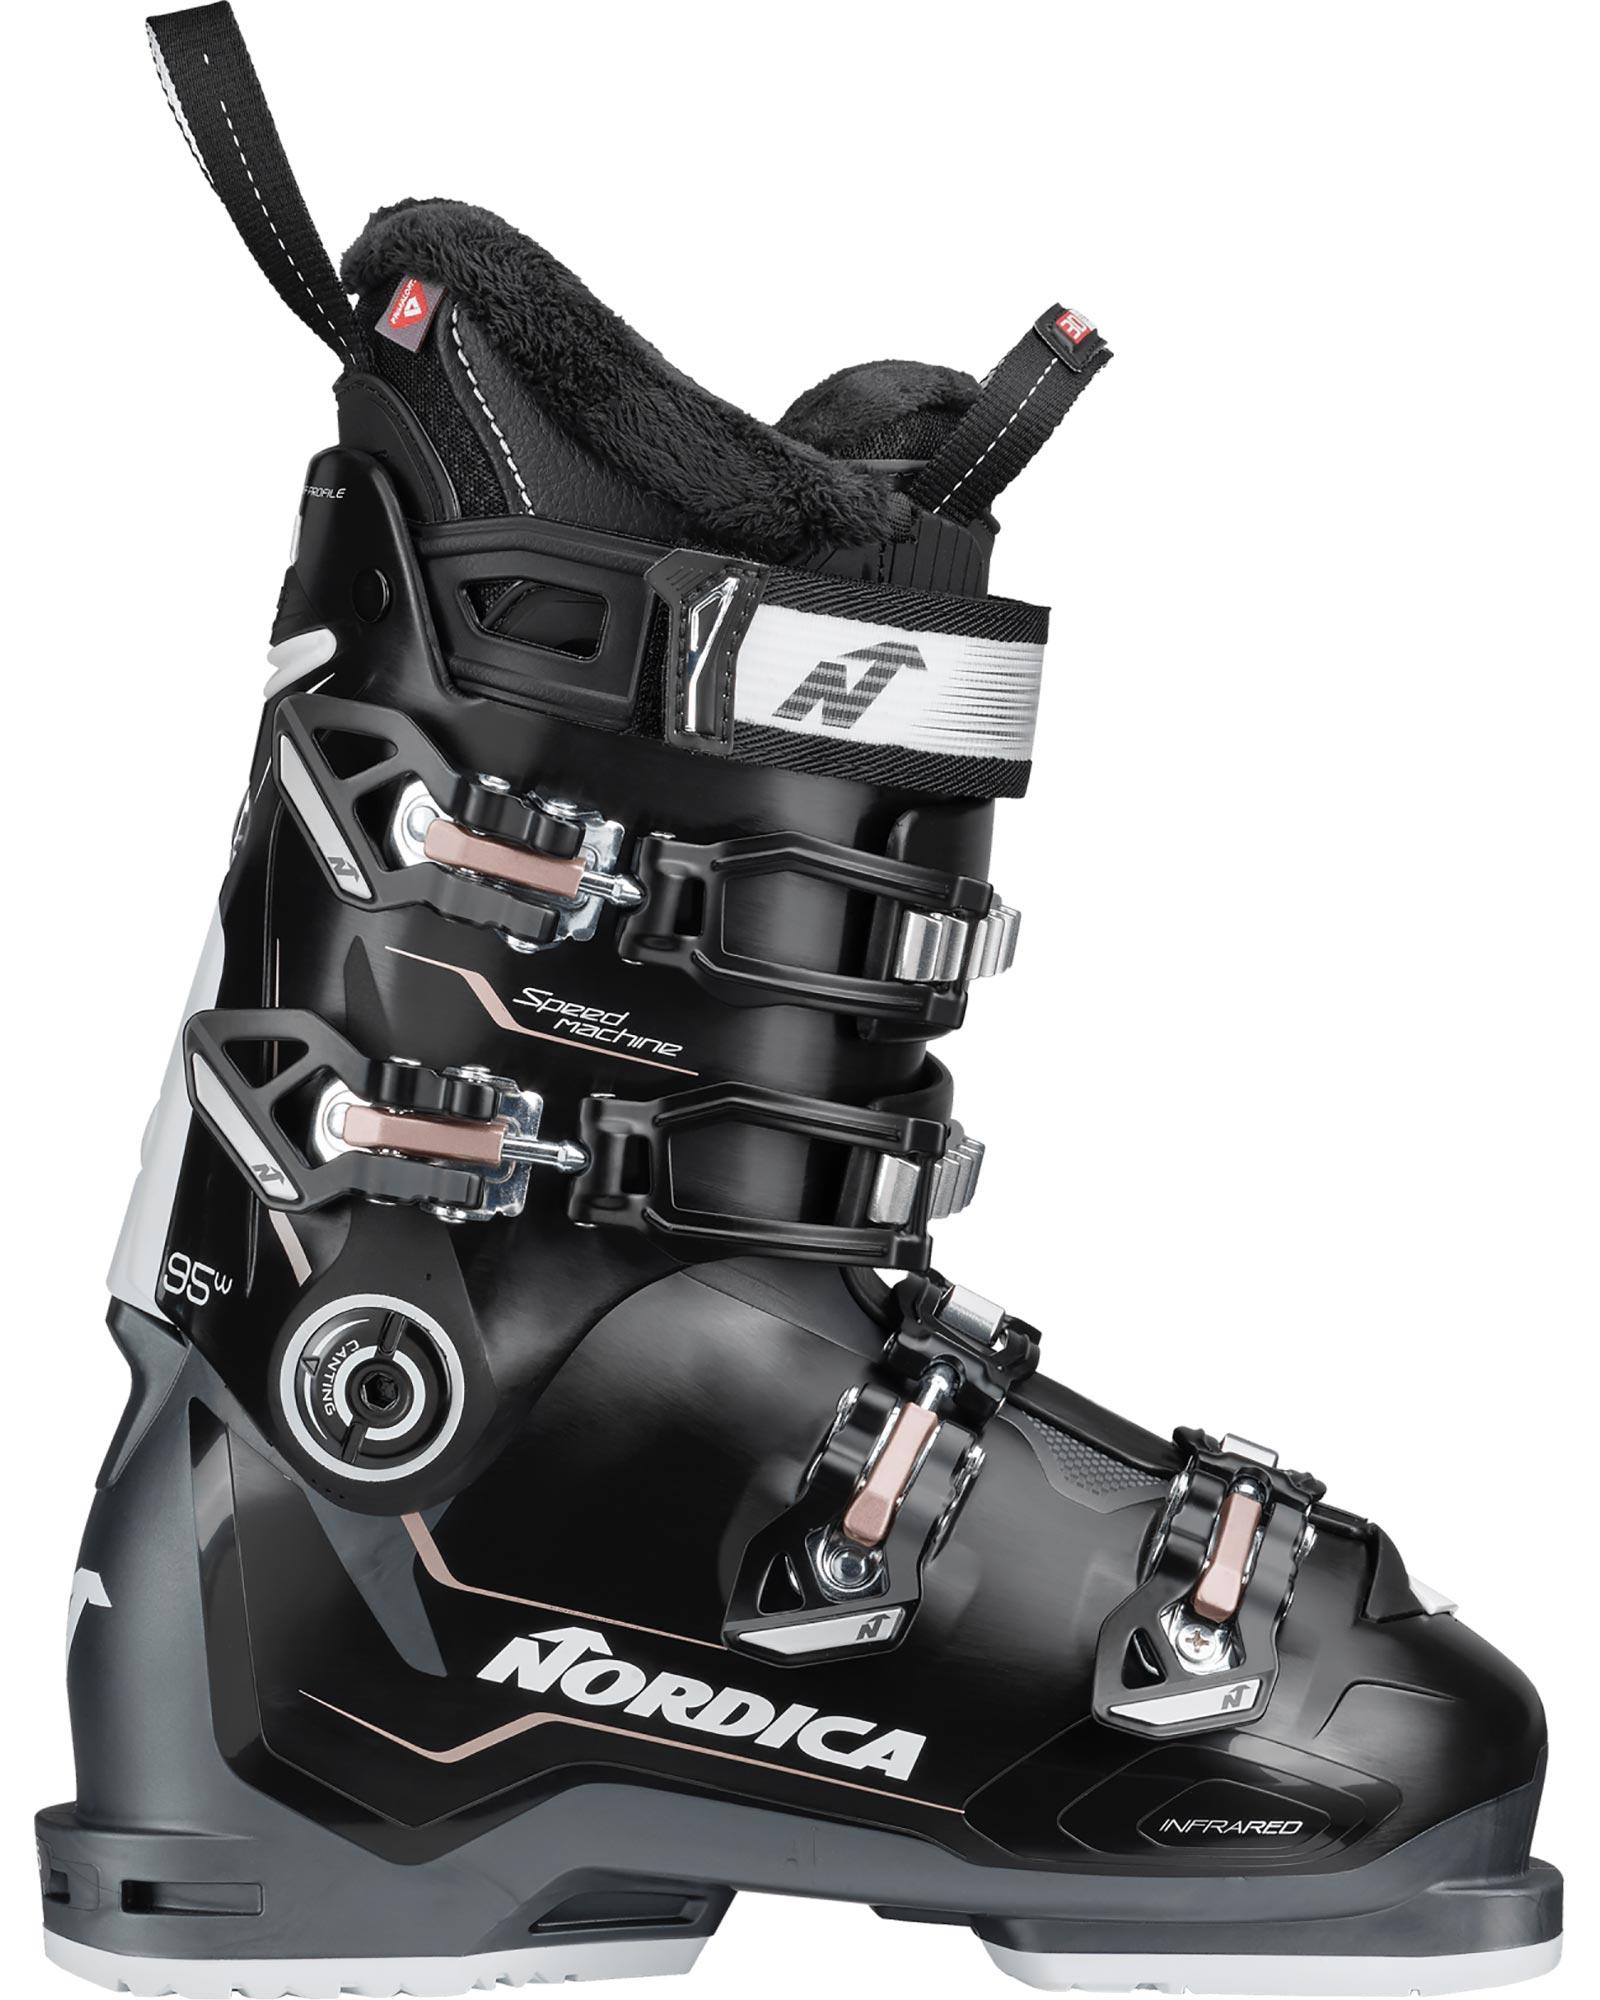 Nordica Women's Speedmachine 95 W Ski Boots 2021 0